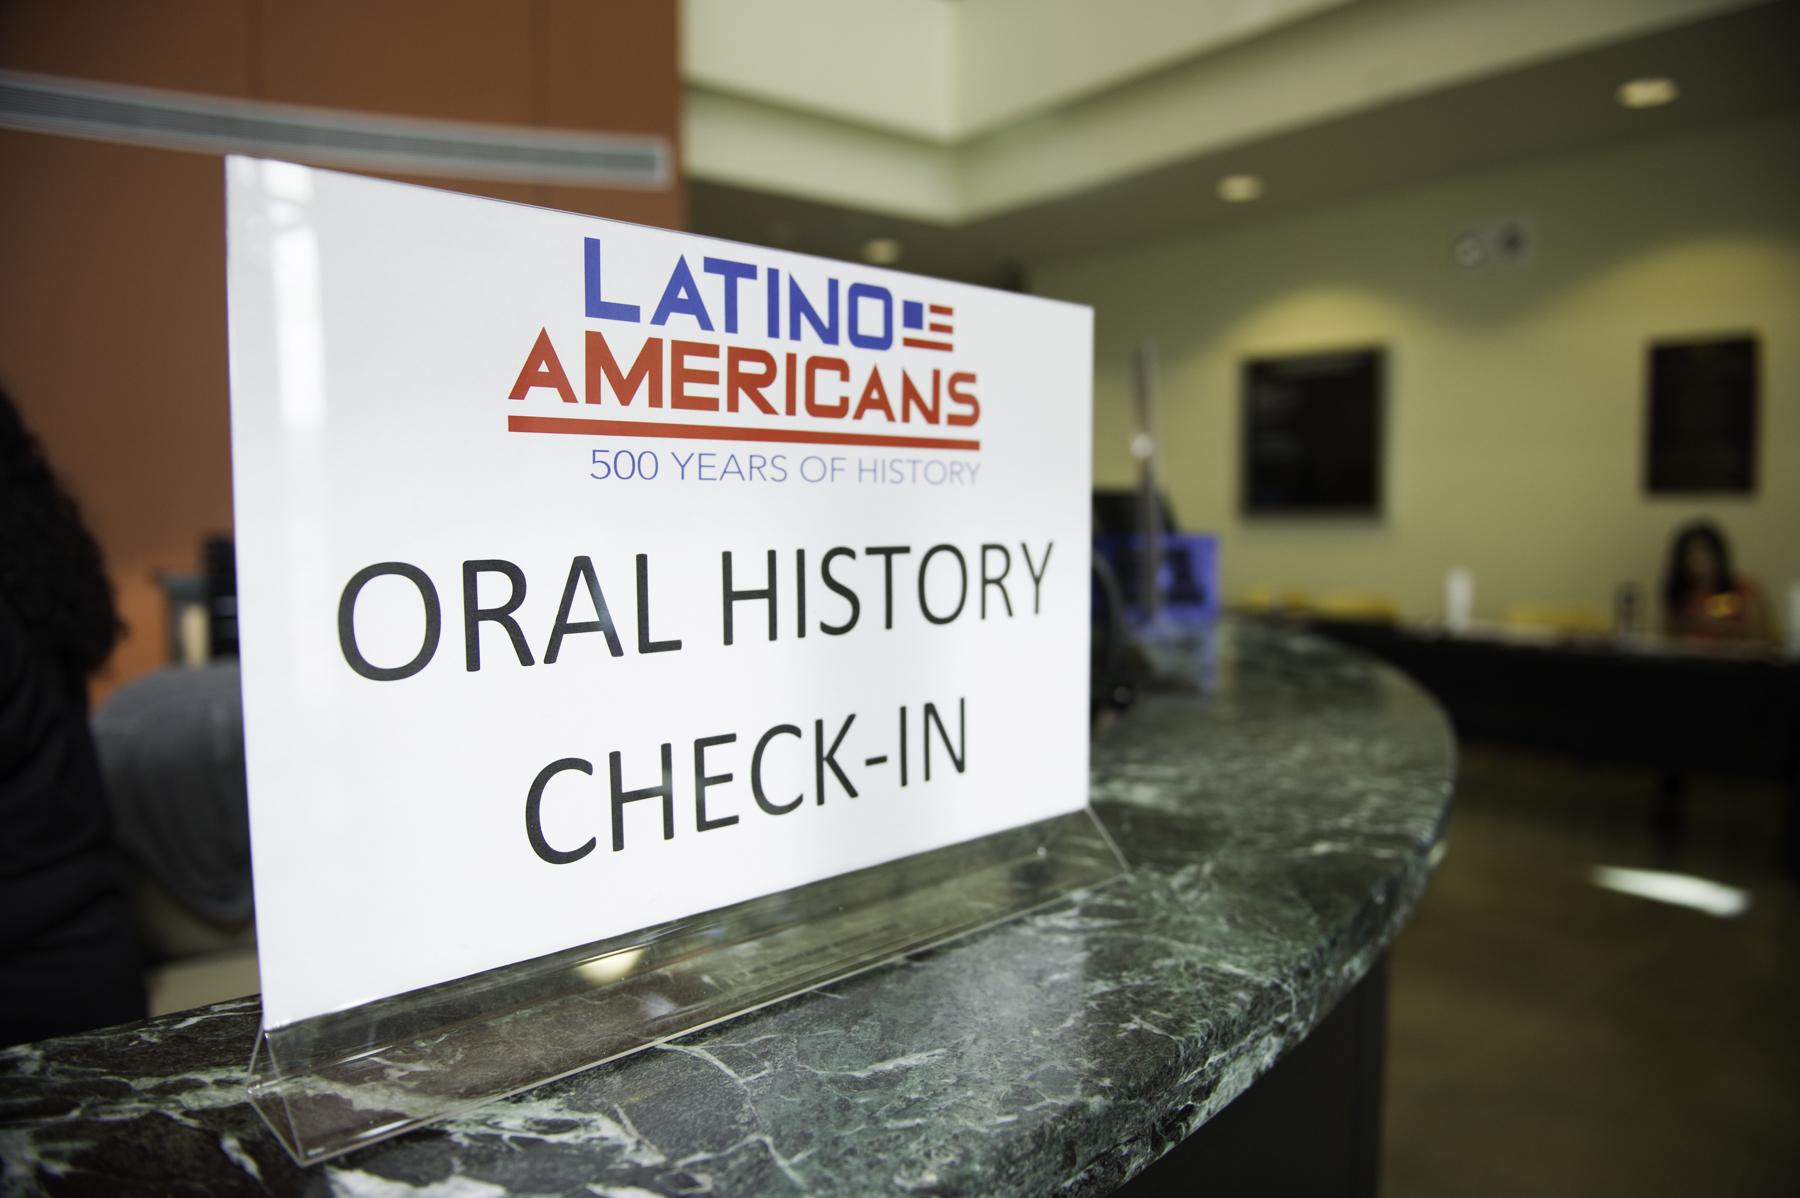 Latino Americans Event 19-4573